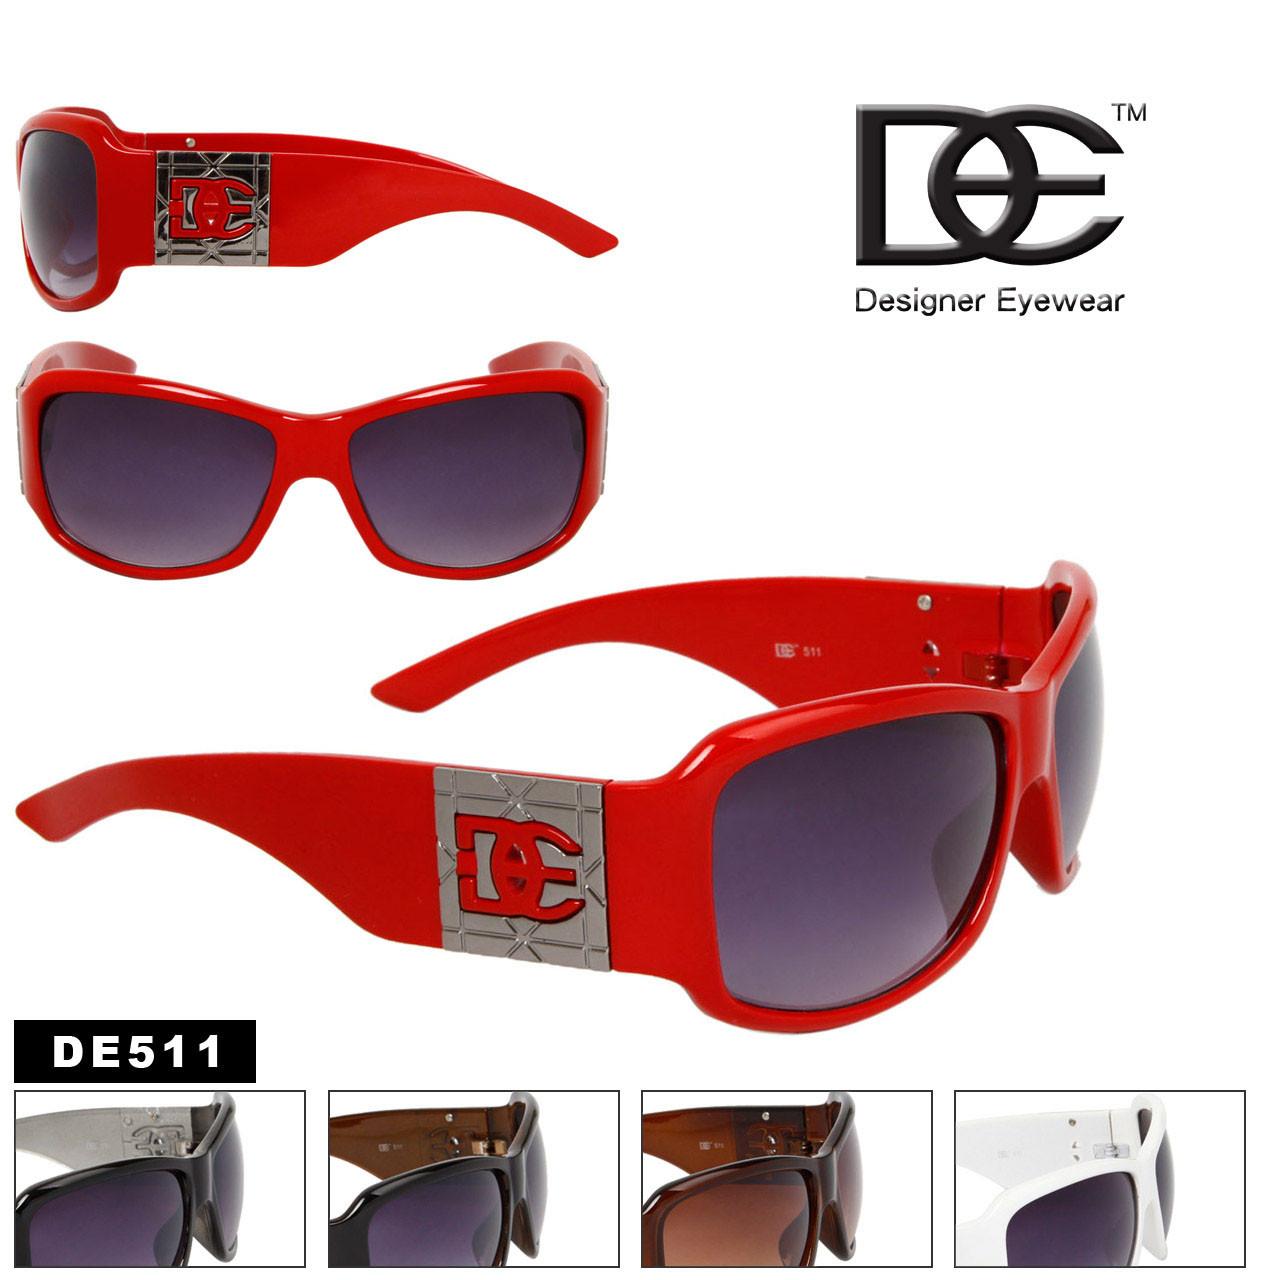 DE511 Women's Designer Sunglasses